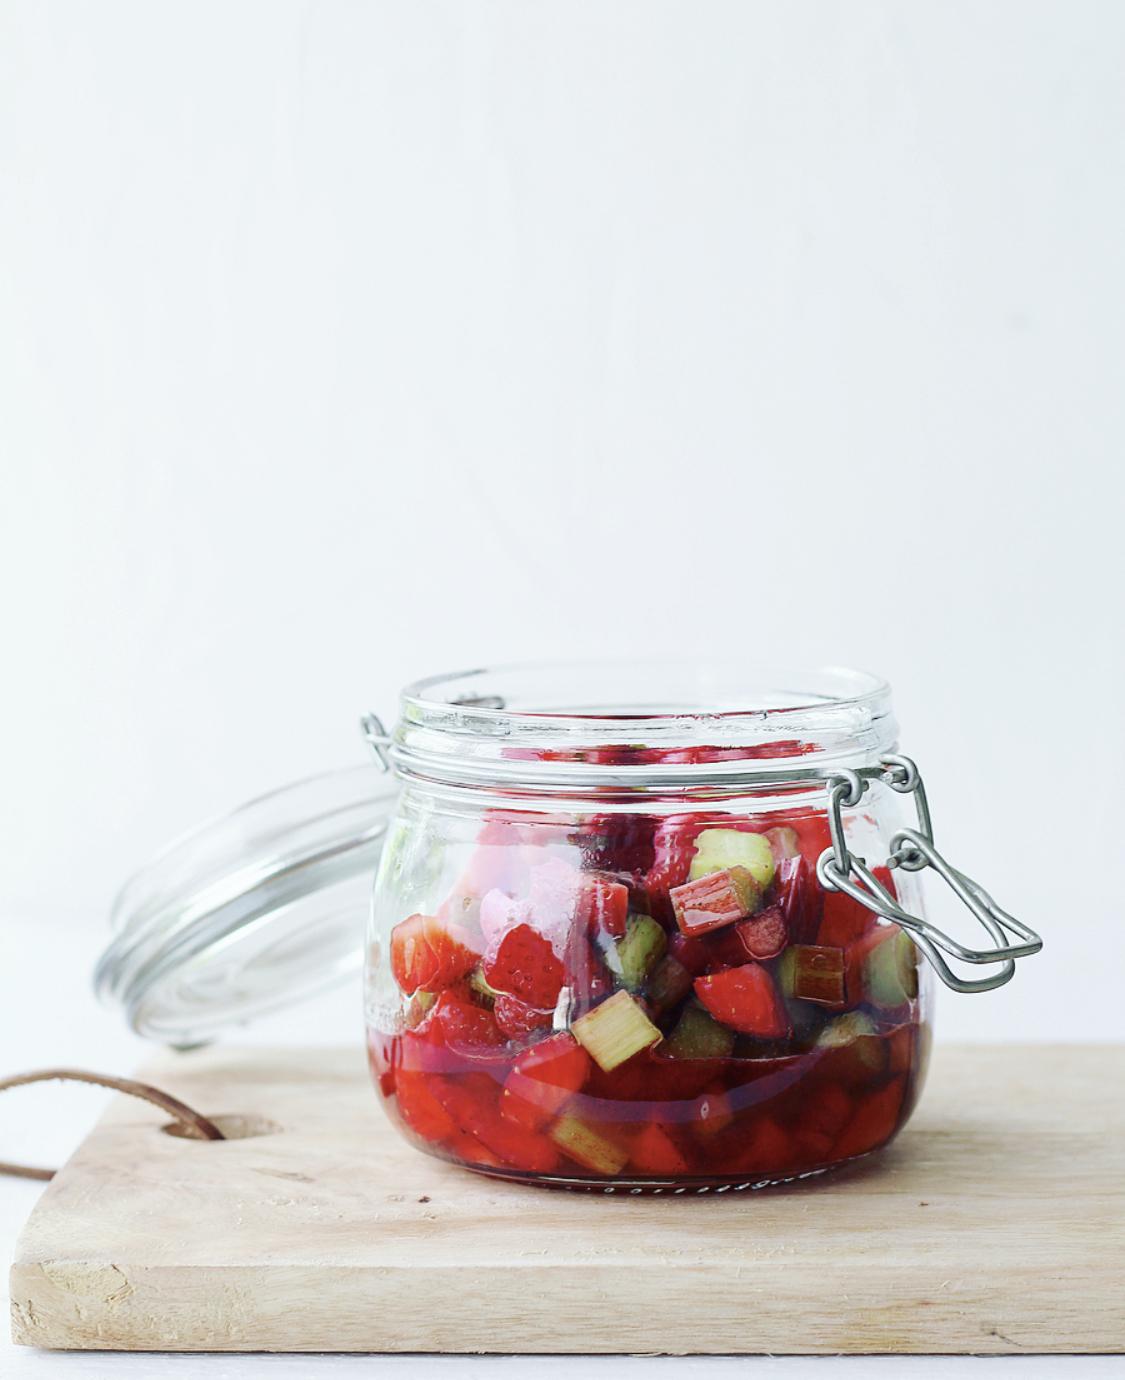 Råmarineret rabarber med jordbær